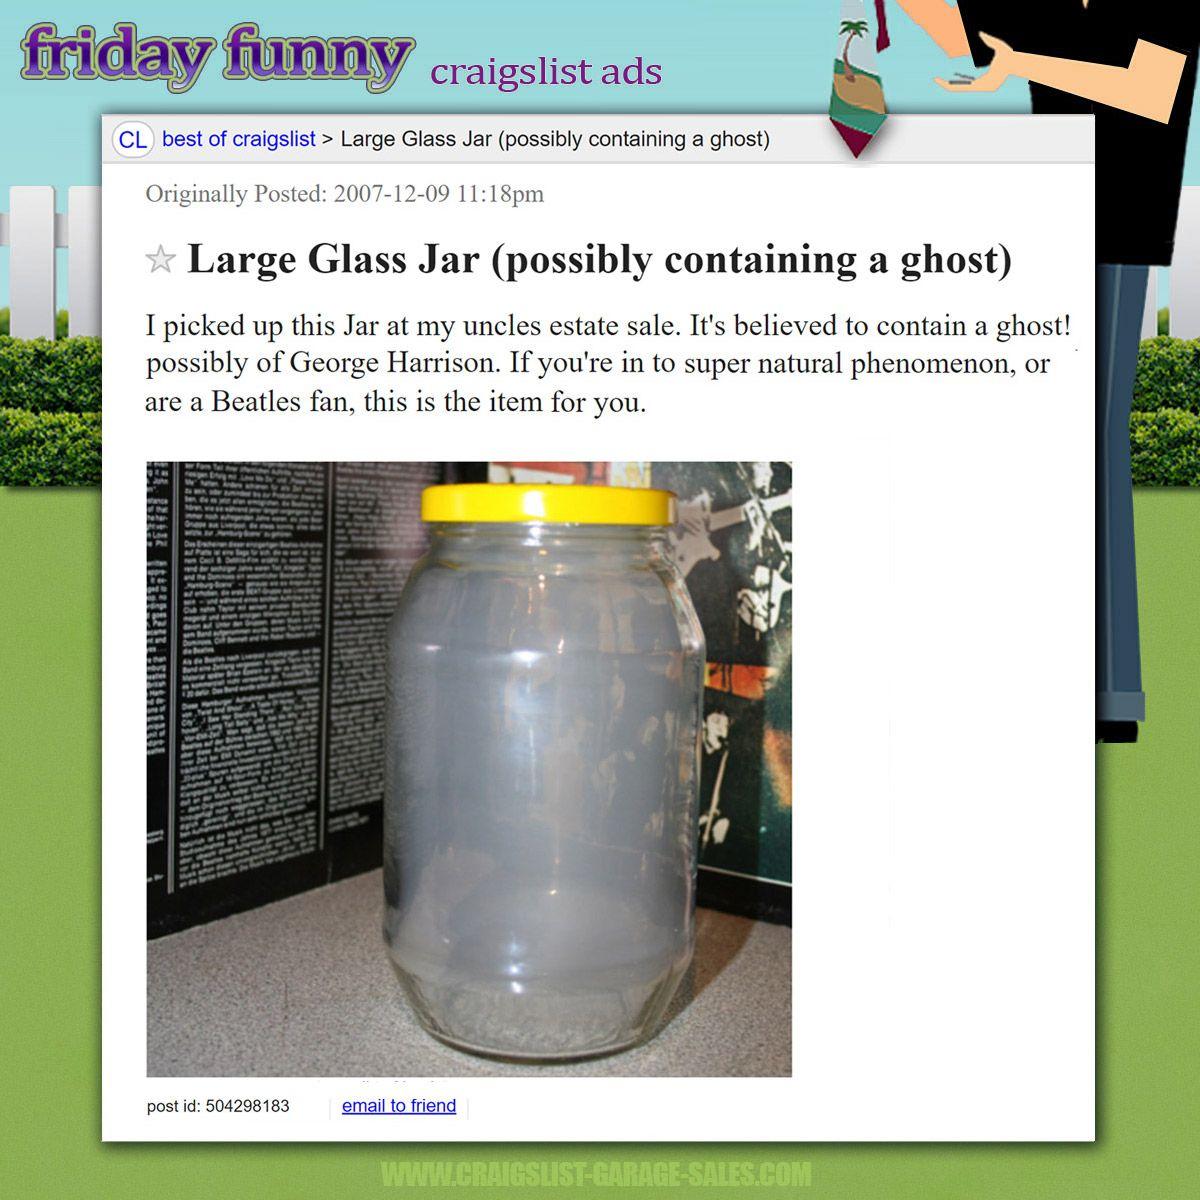 Funny Craigslist Ads Ghost Of Garage Sales Past Funny Craigslist Ads Friday Humor Funny Ghost